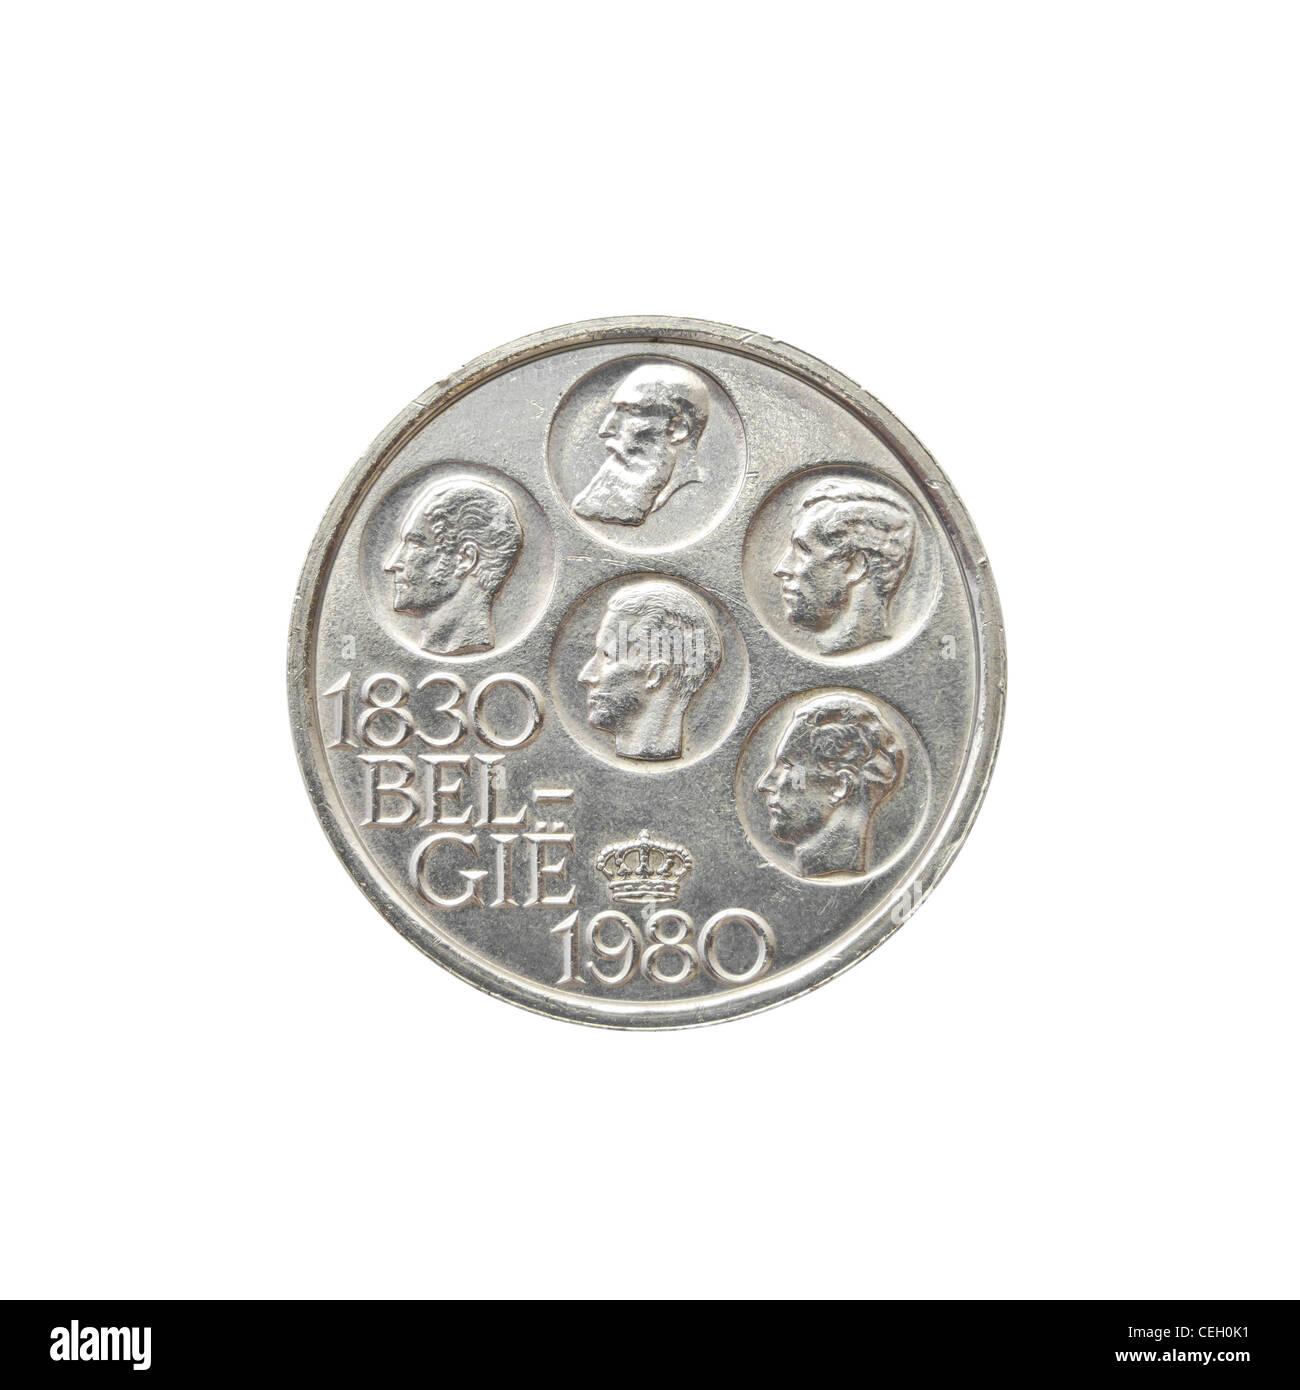 Belgian Silver Coin - Stock Image